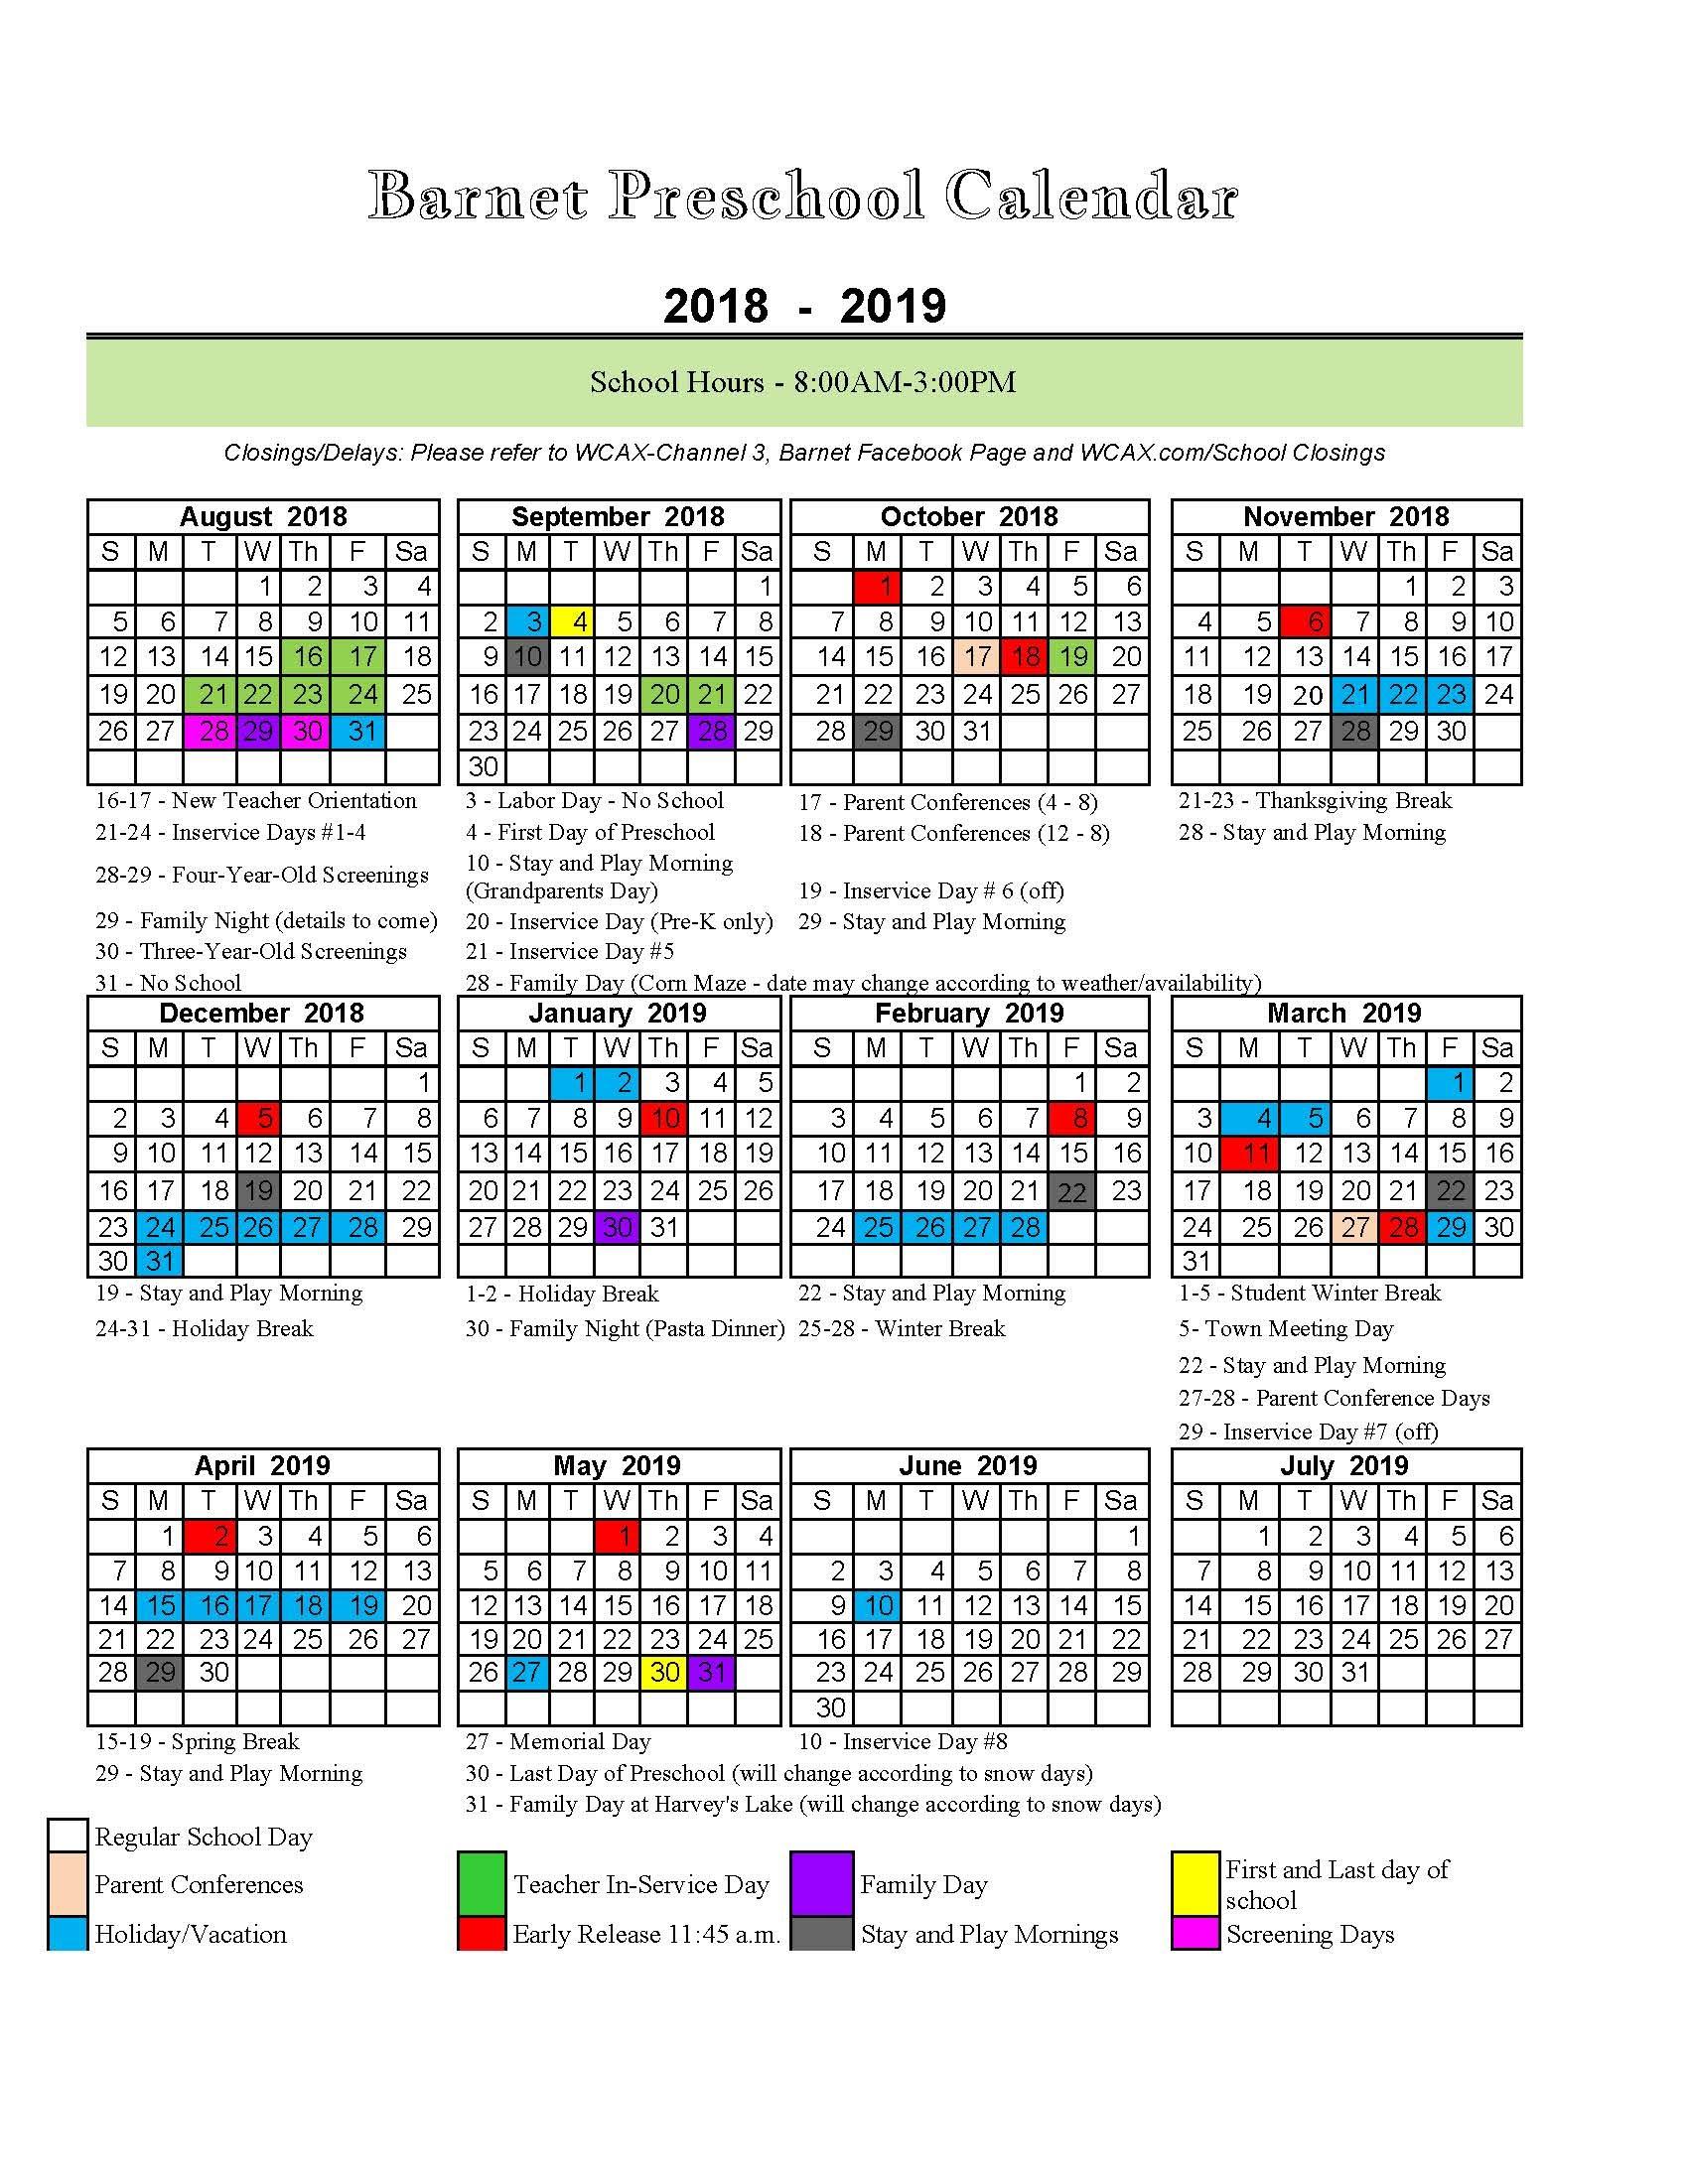 2019 Calendar Please 2018 19 Preschool Calendar   BarSchool